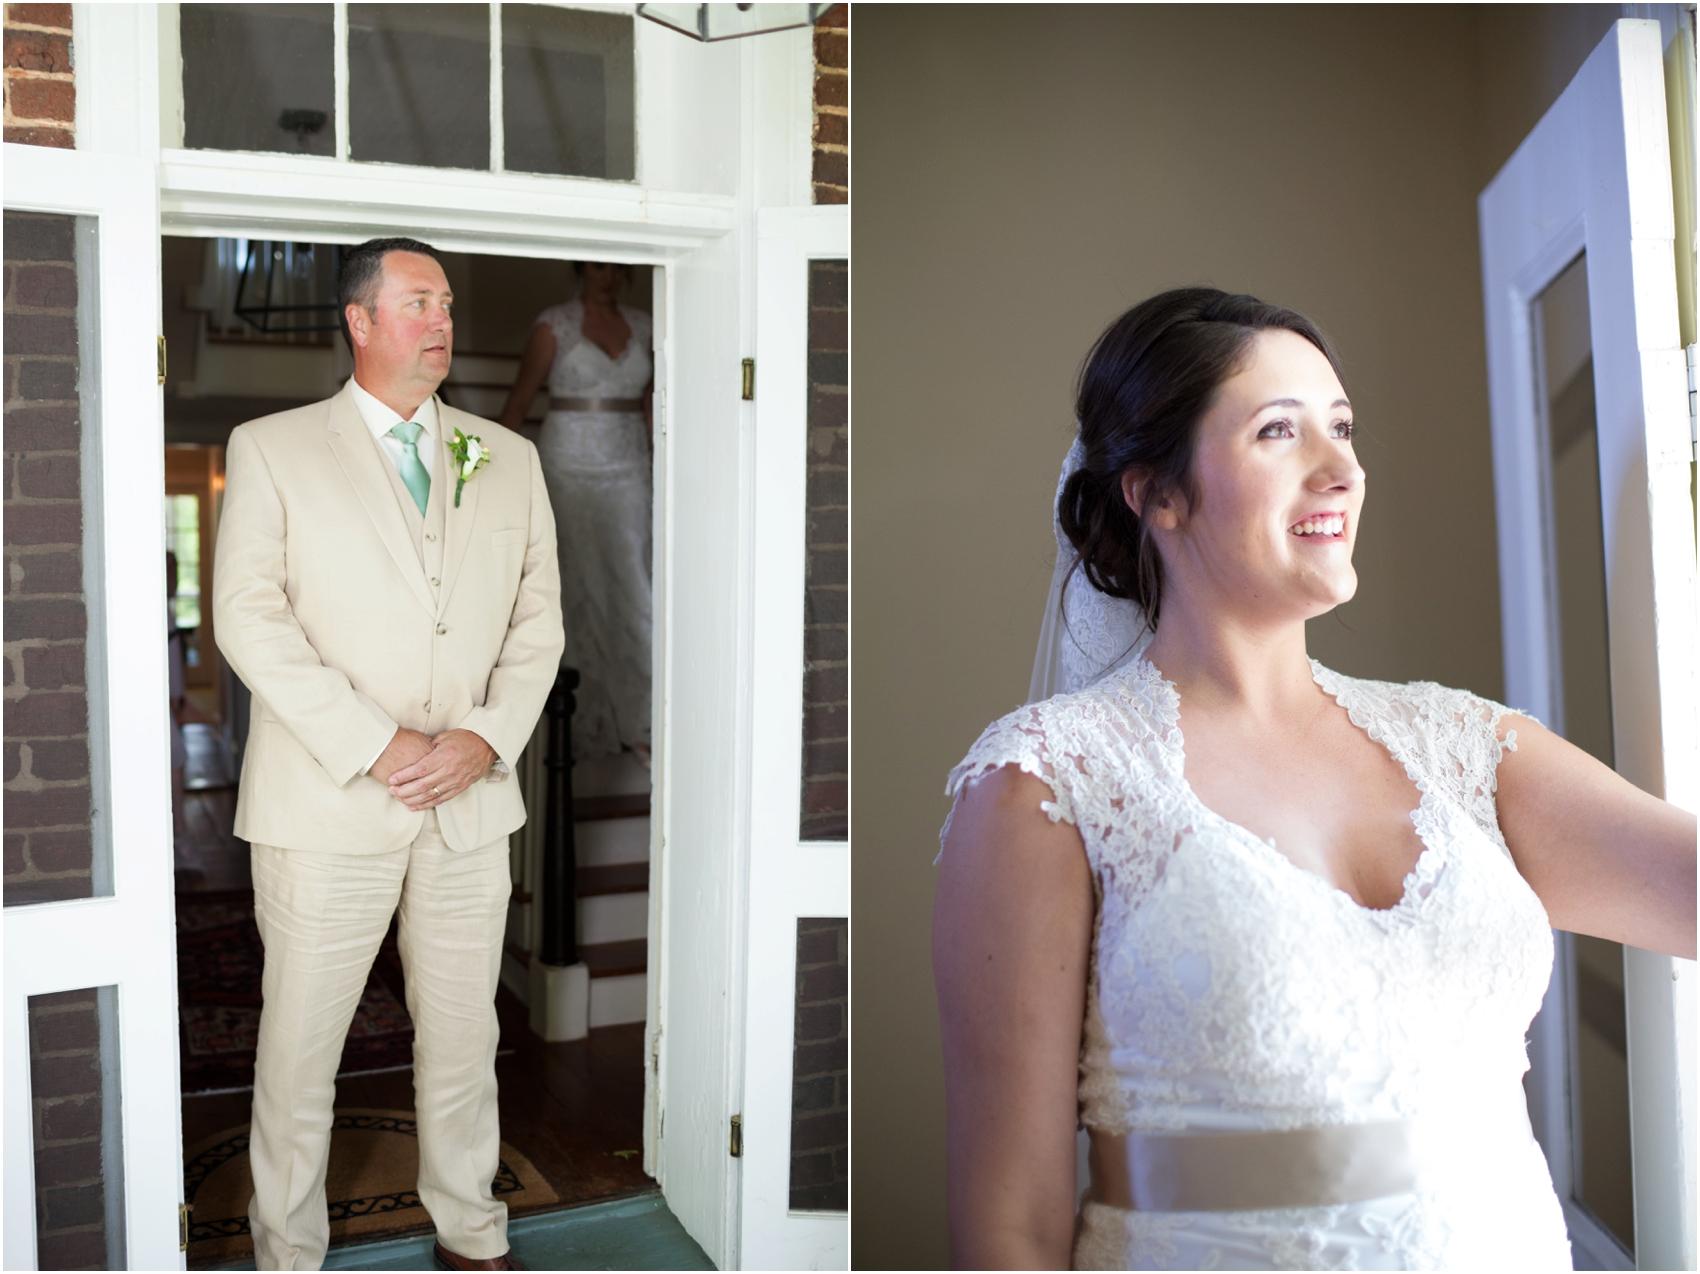 Rodes Farm Charlottesville VA Wedding-1-4.jpg